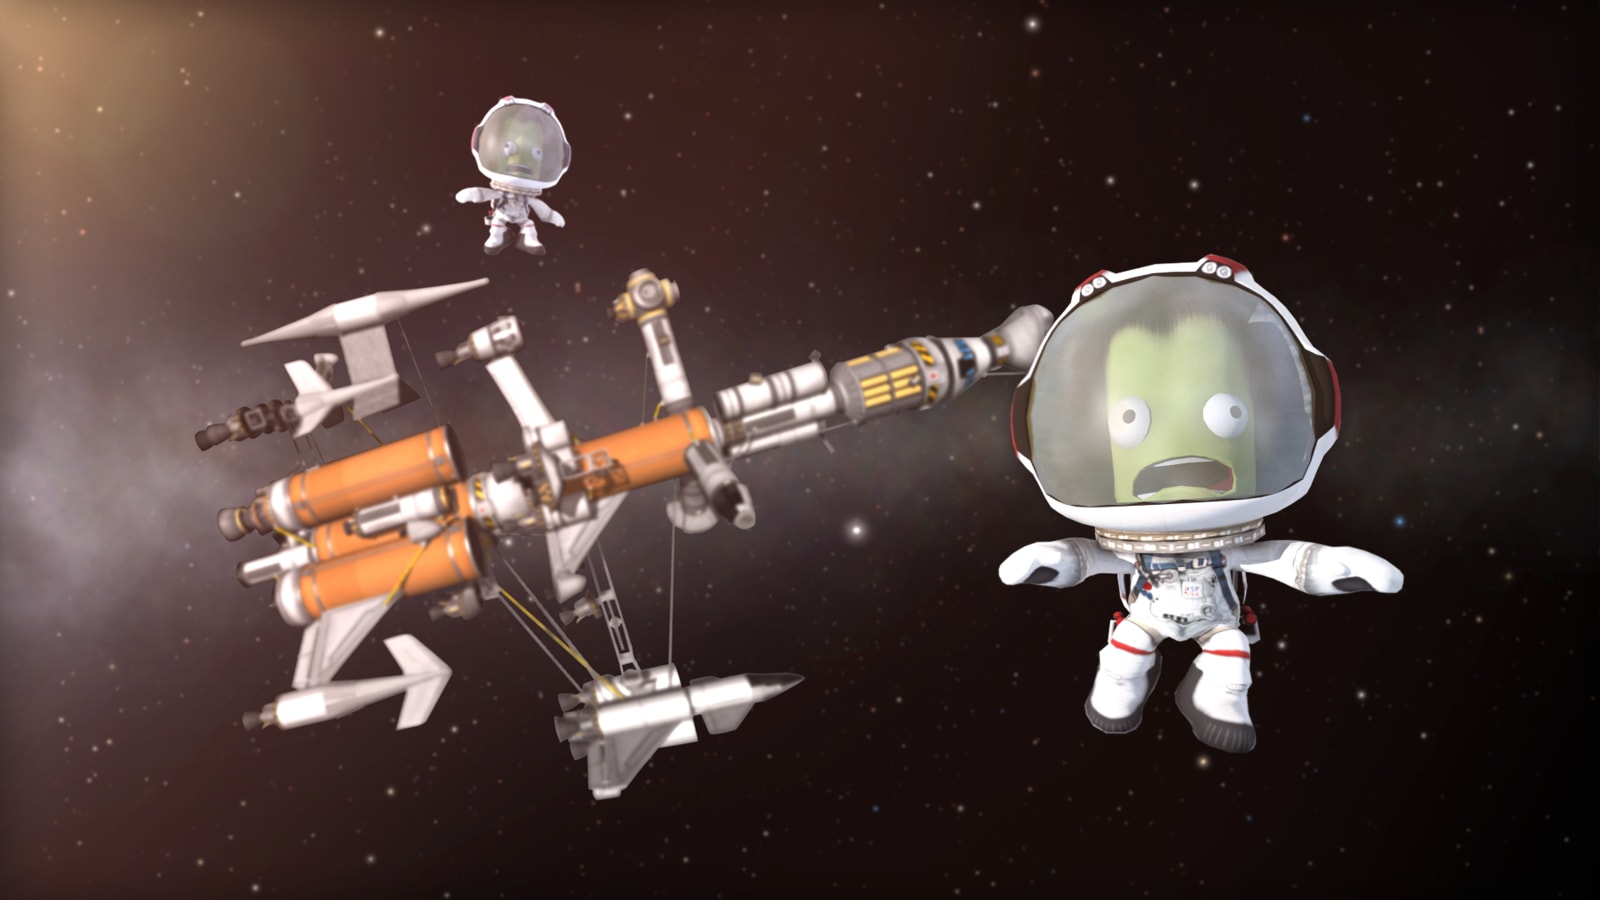 kerbal space program free download mac 2017